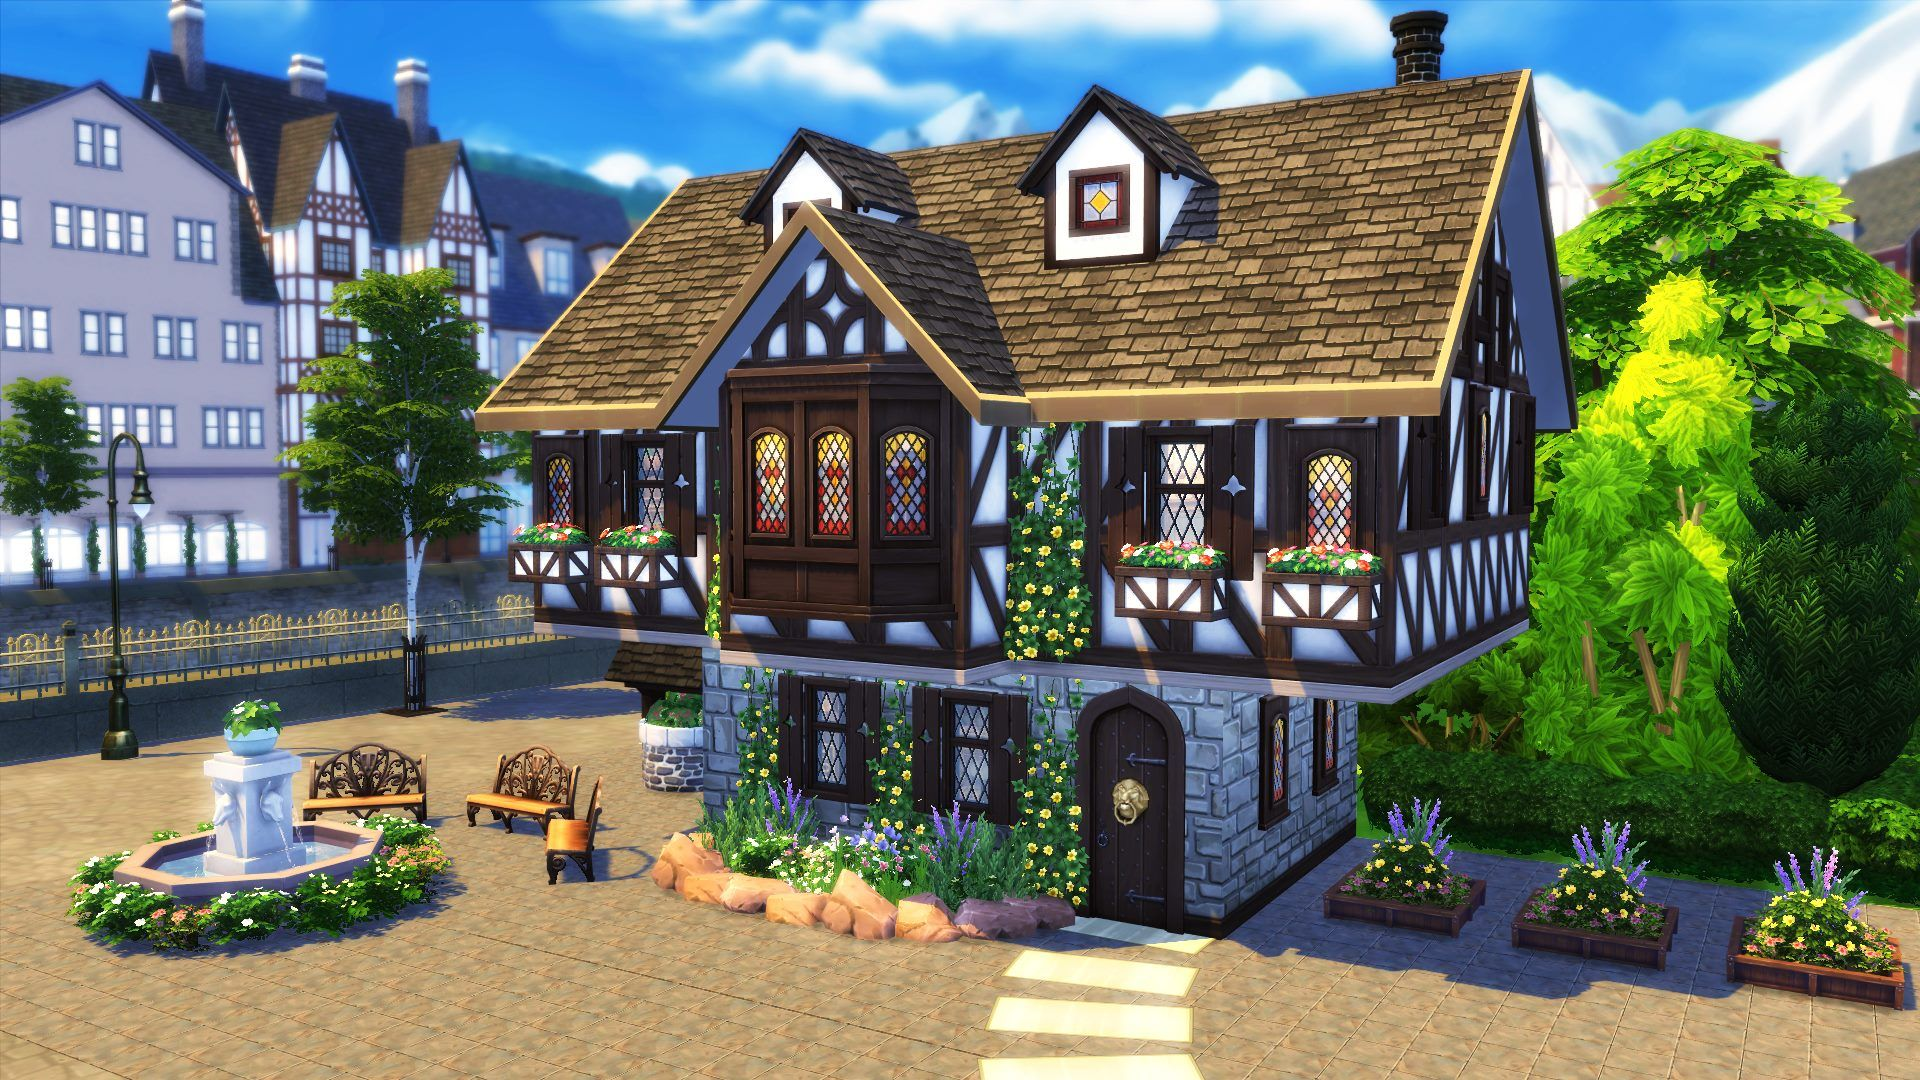 The sims 4 build tutorial how to build a tudor house sims community